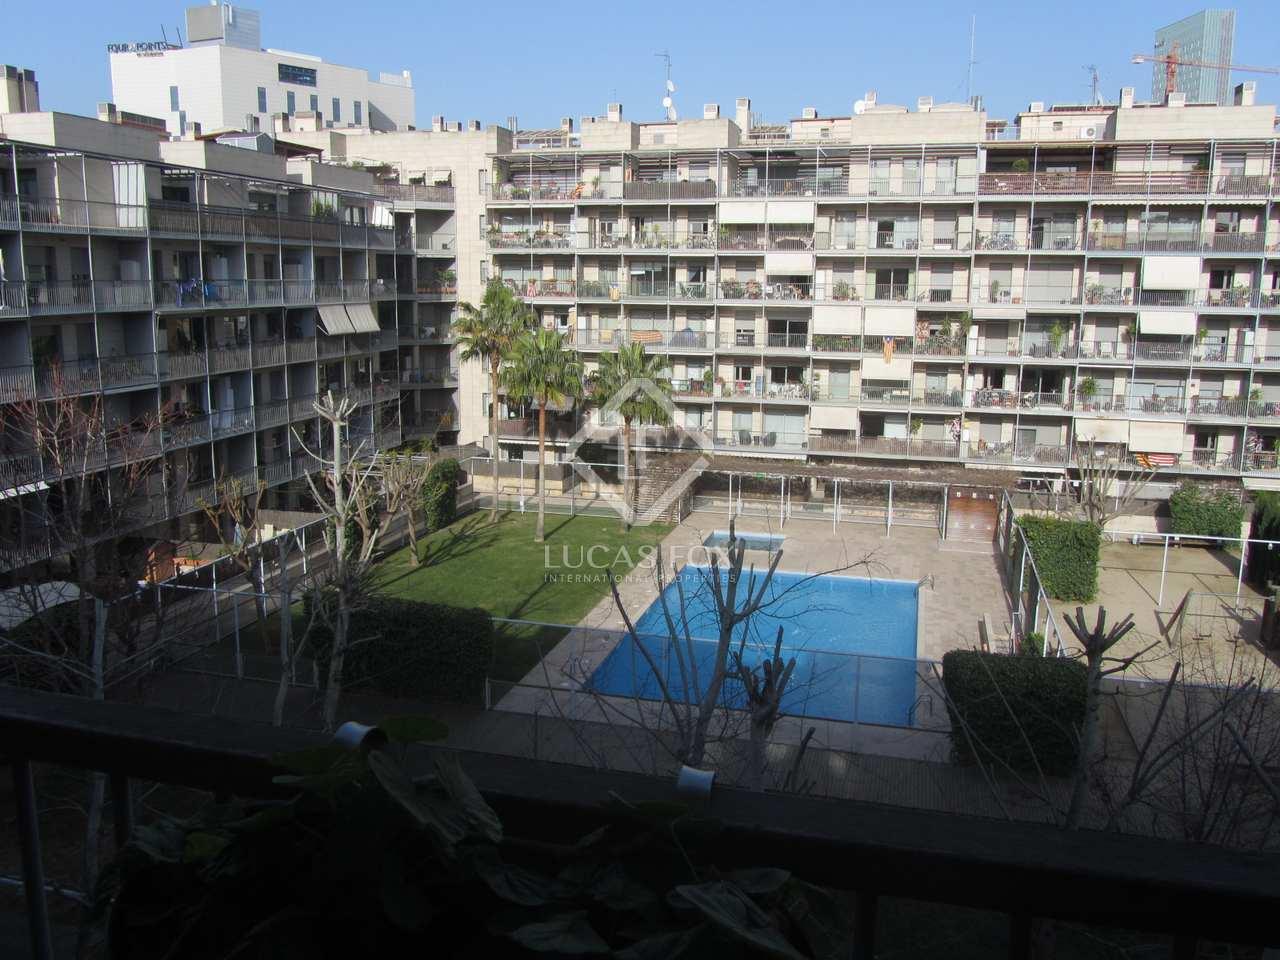 Piso en alquiler en poblenou barcelona for Alquiler casa jardin barcelona